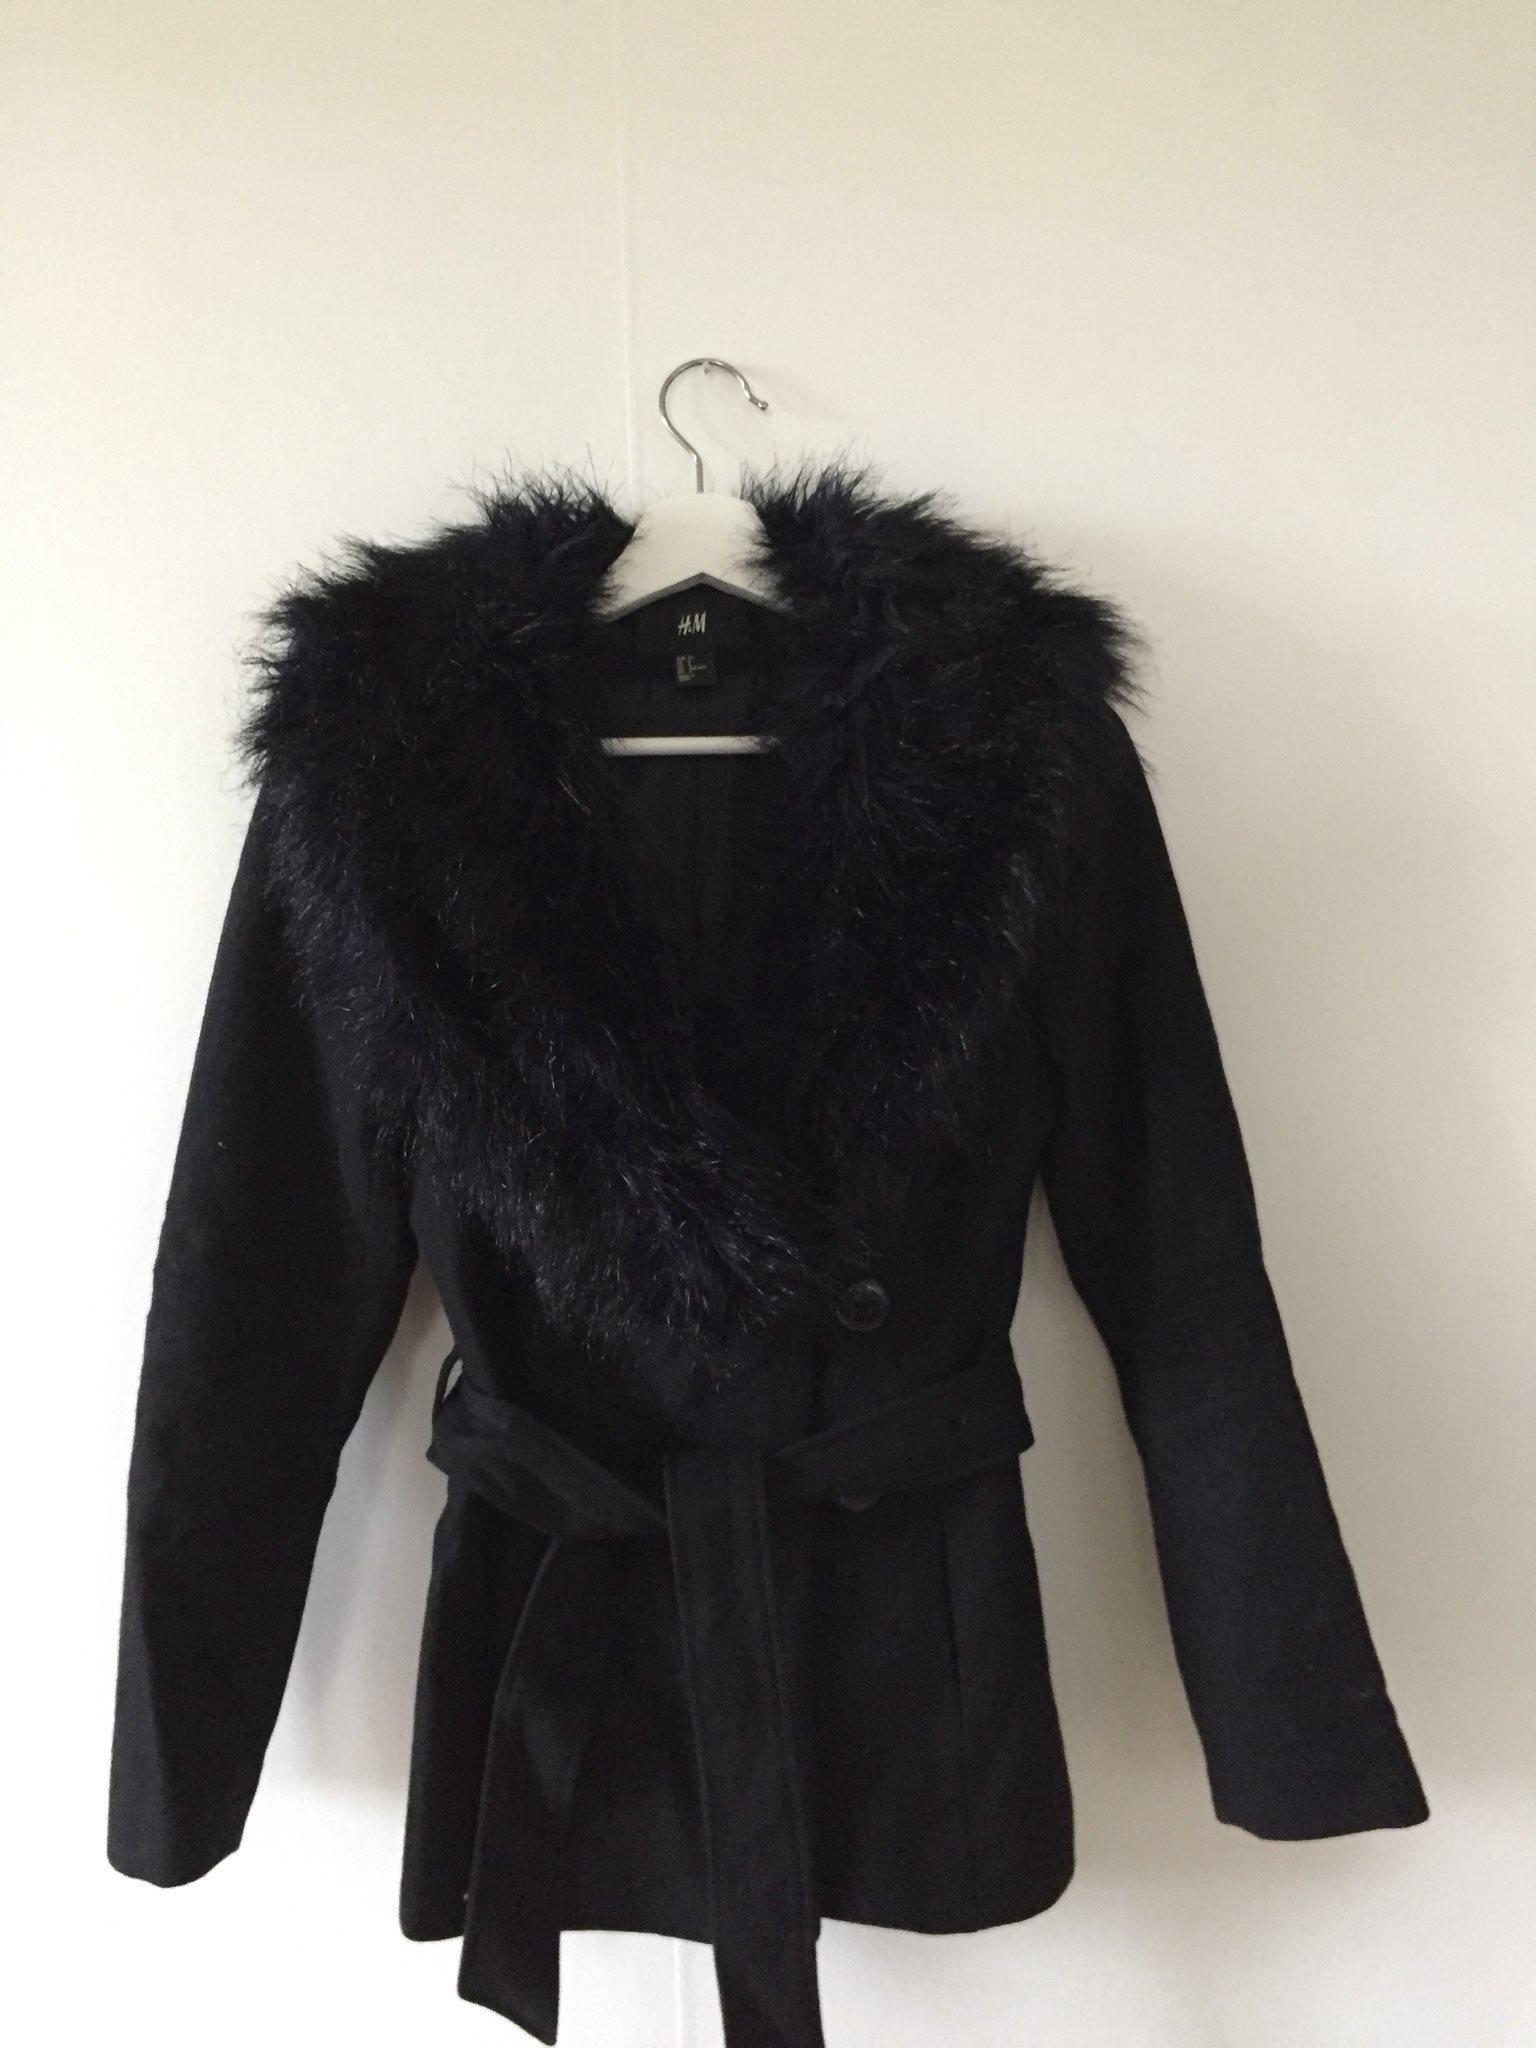 svart kappa med pälskrage